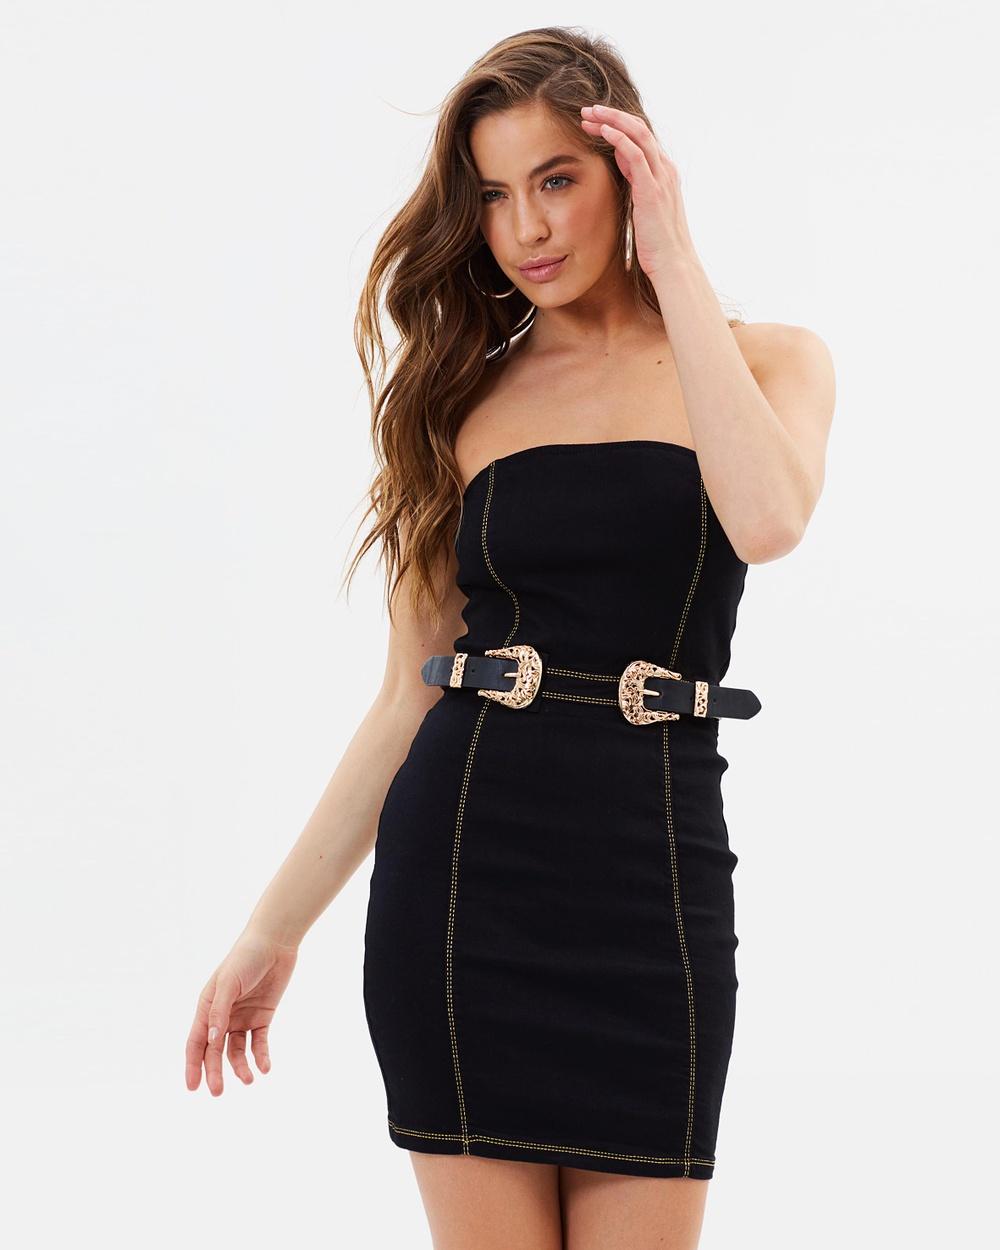 Missguided Strapless Buckle Detail Denim Dress Bodycon Dresses Black Strapless Buckle Detail Denim Dress